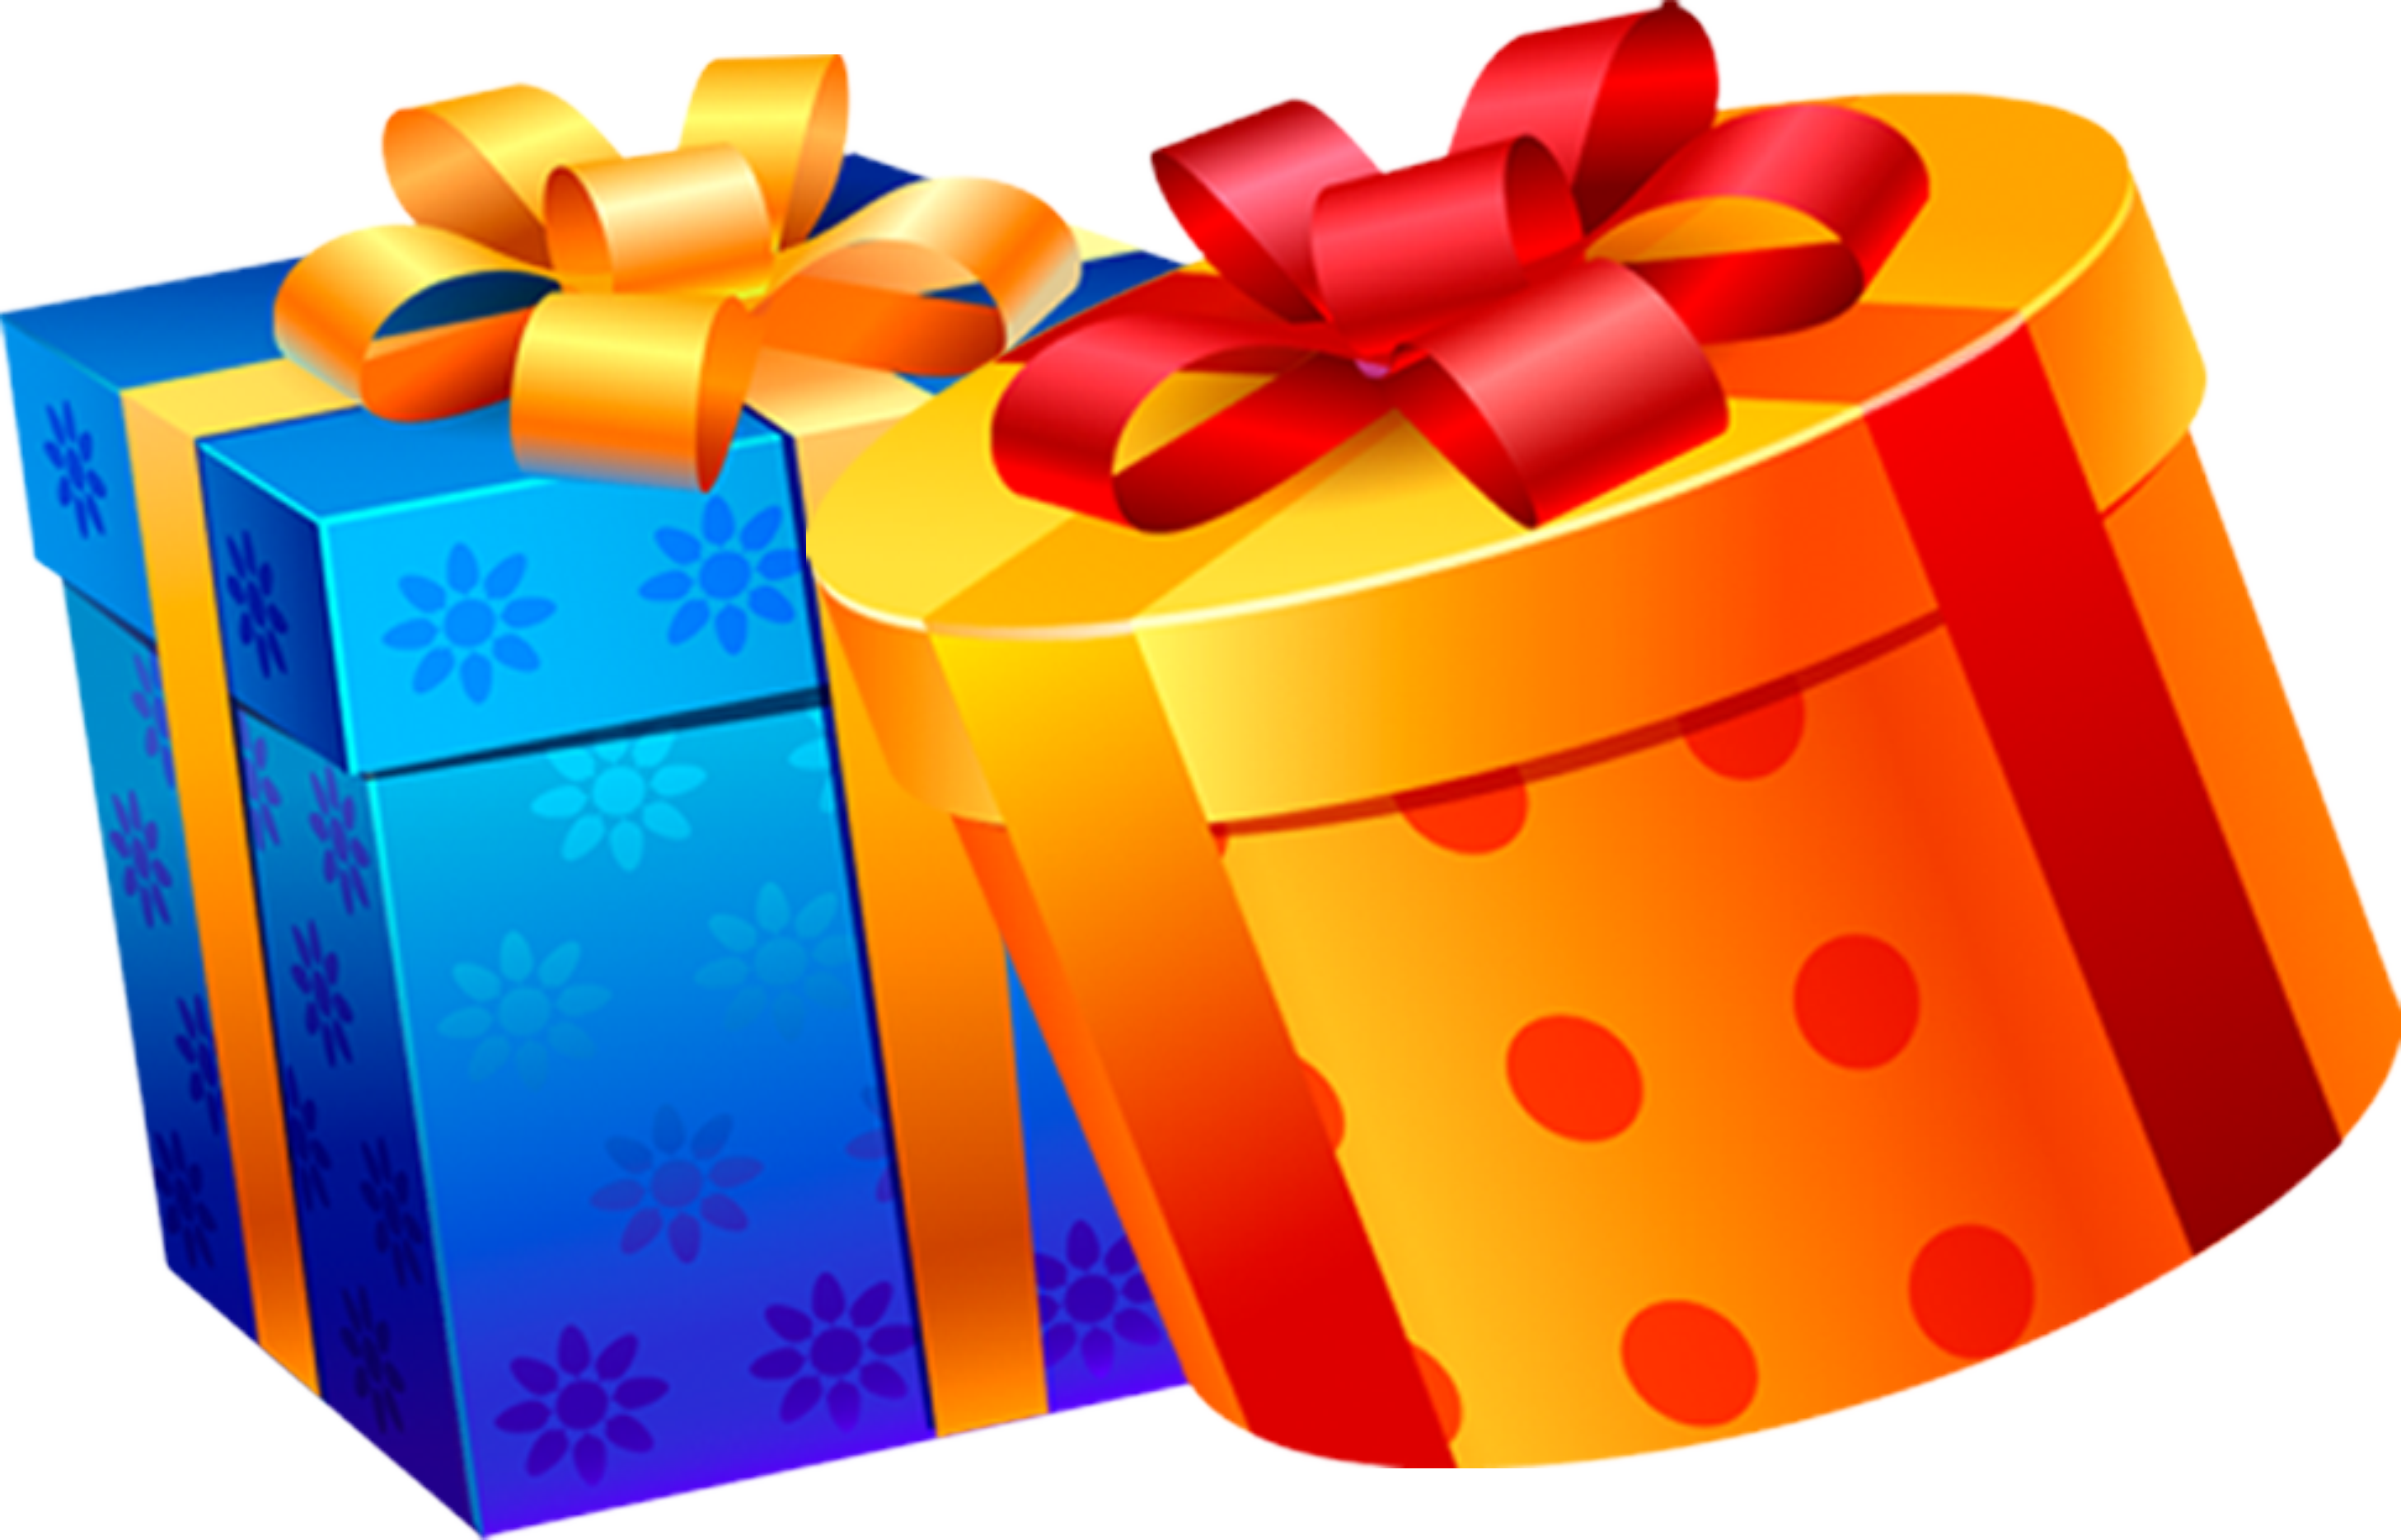 Pastel de cumplea os. Gift clipart regalo